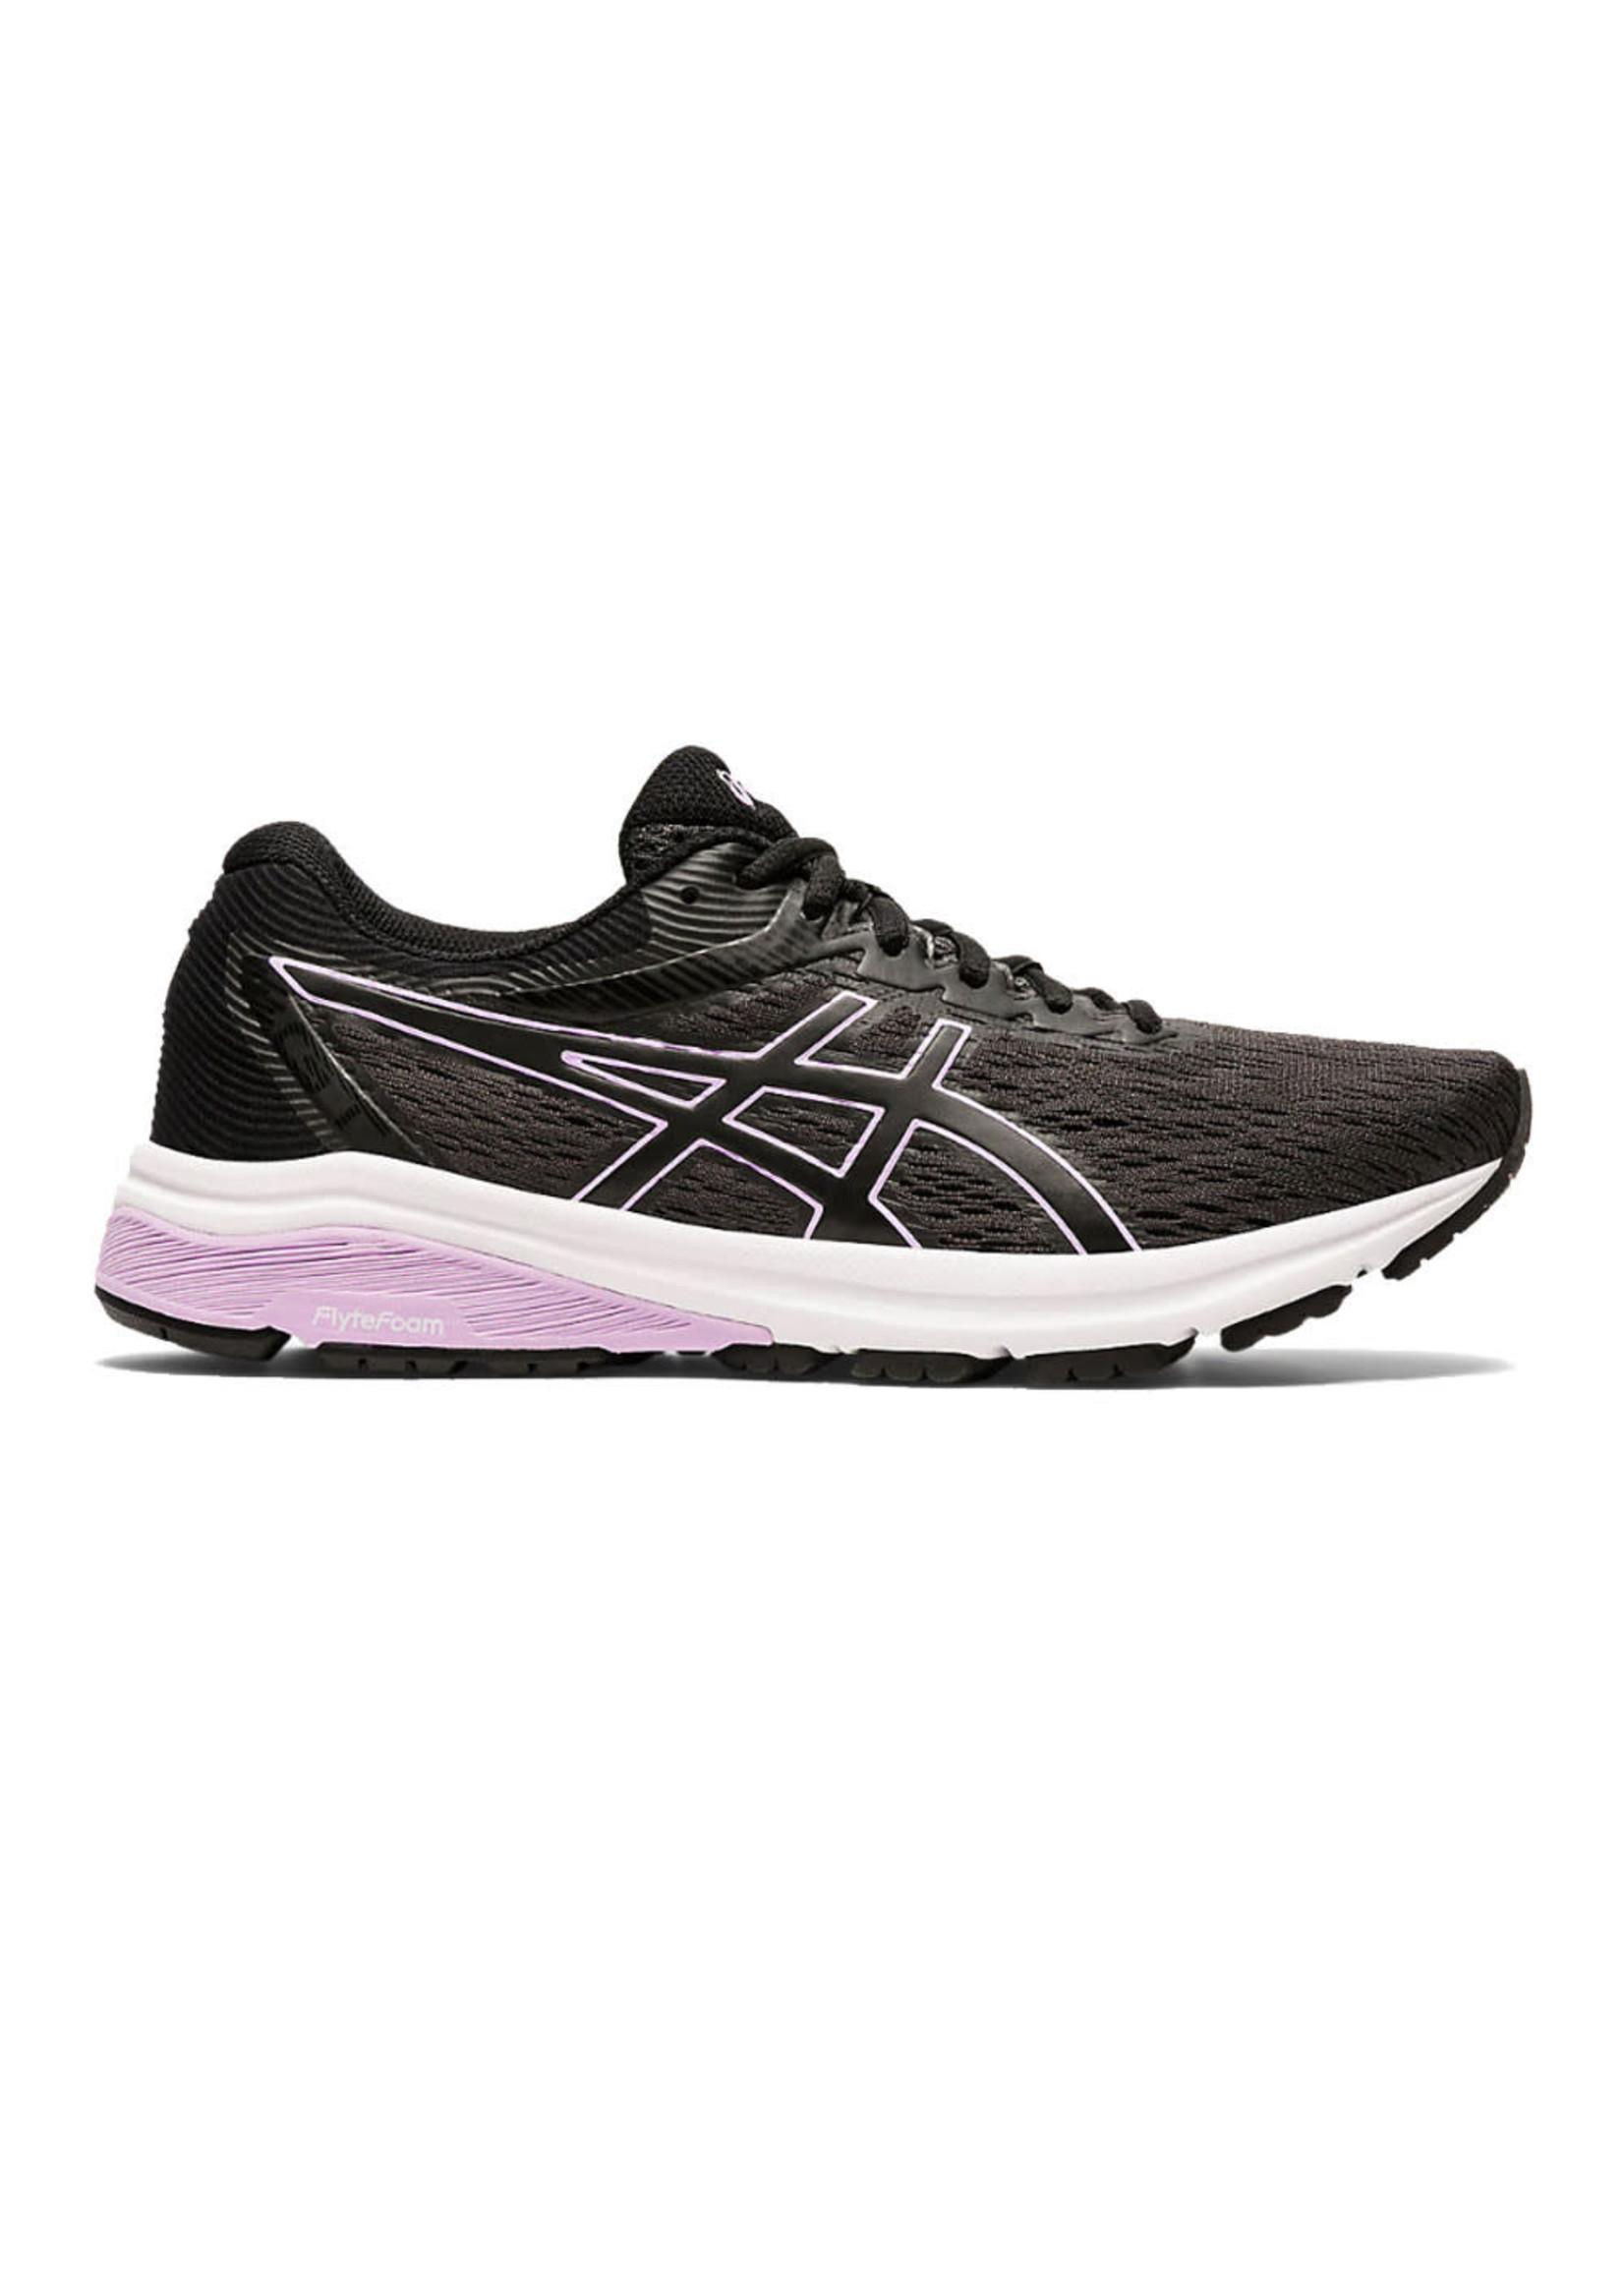 Asics Asics GT-800 Womans Running Shoe (2020), Graphite Grey/Lilac Tech